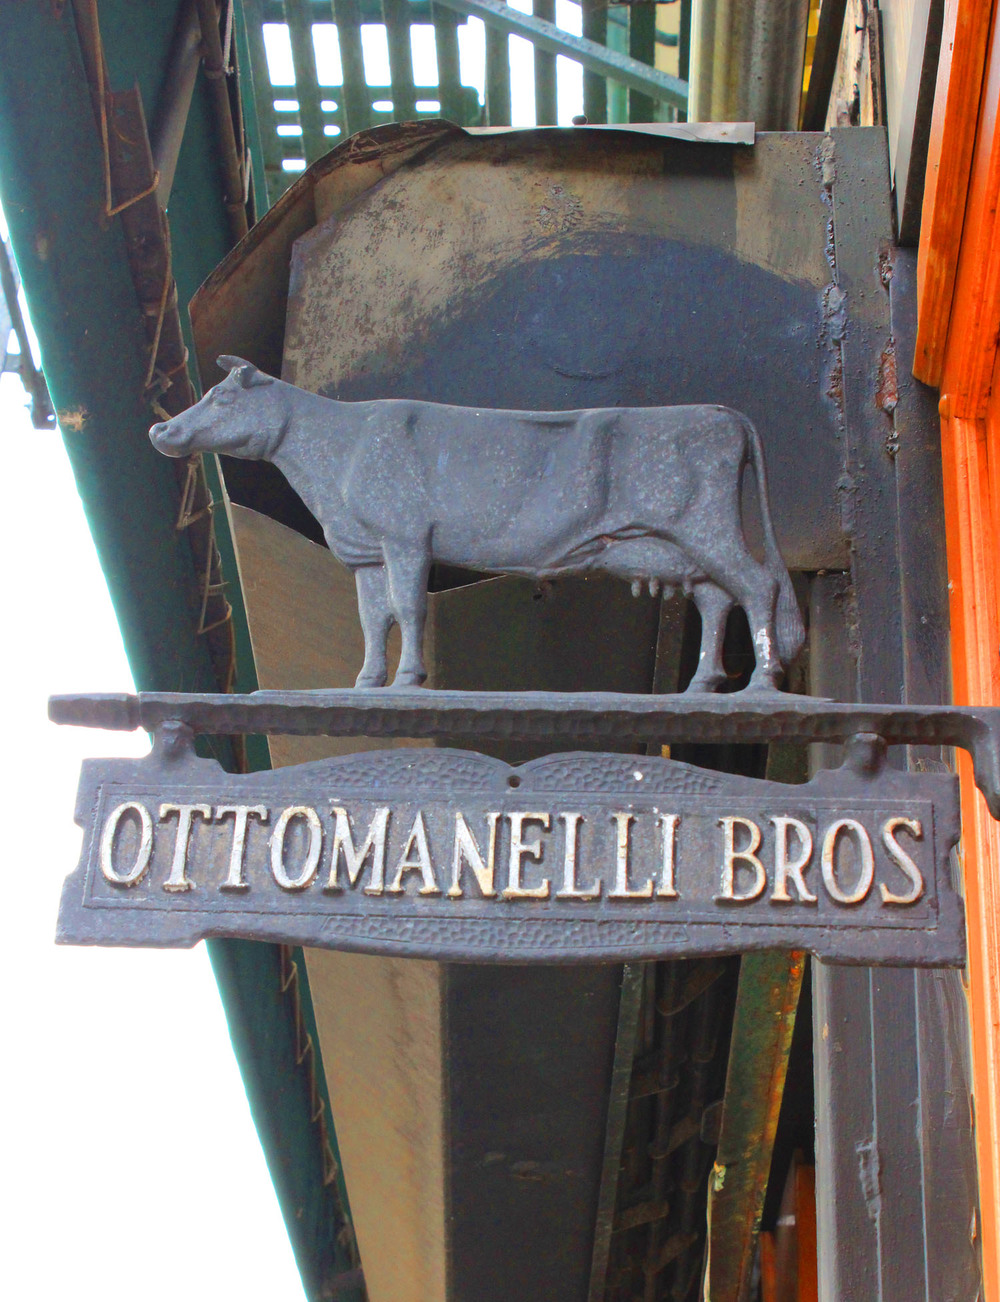 Ottomanelli Bros. Butcher| Image:Laura Messersmith